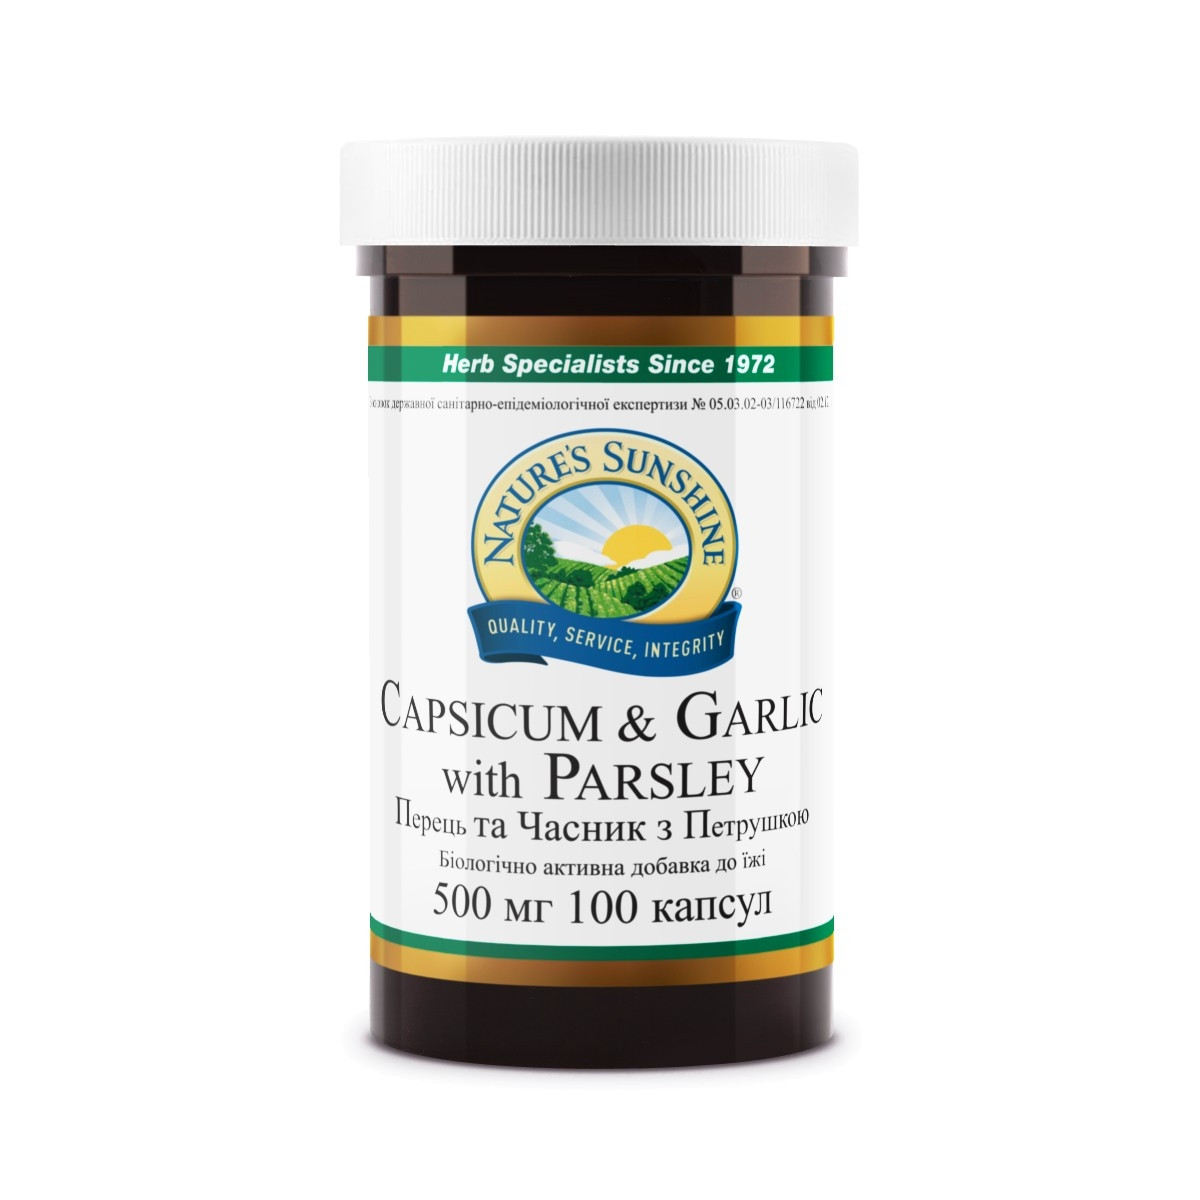 Перец, Чеснок, Петрушка. Capsicum & Garlic with Parsley бад НСП.